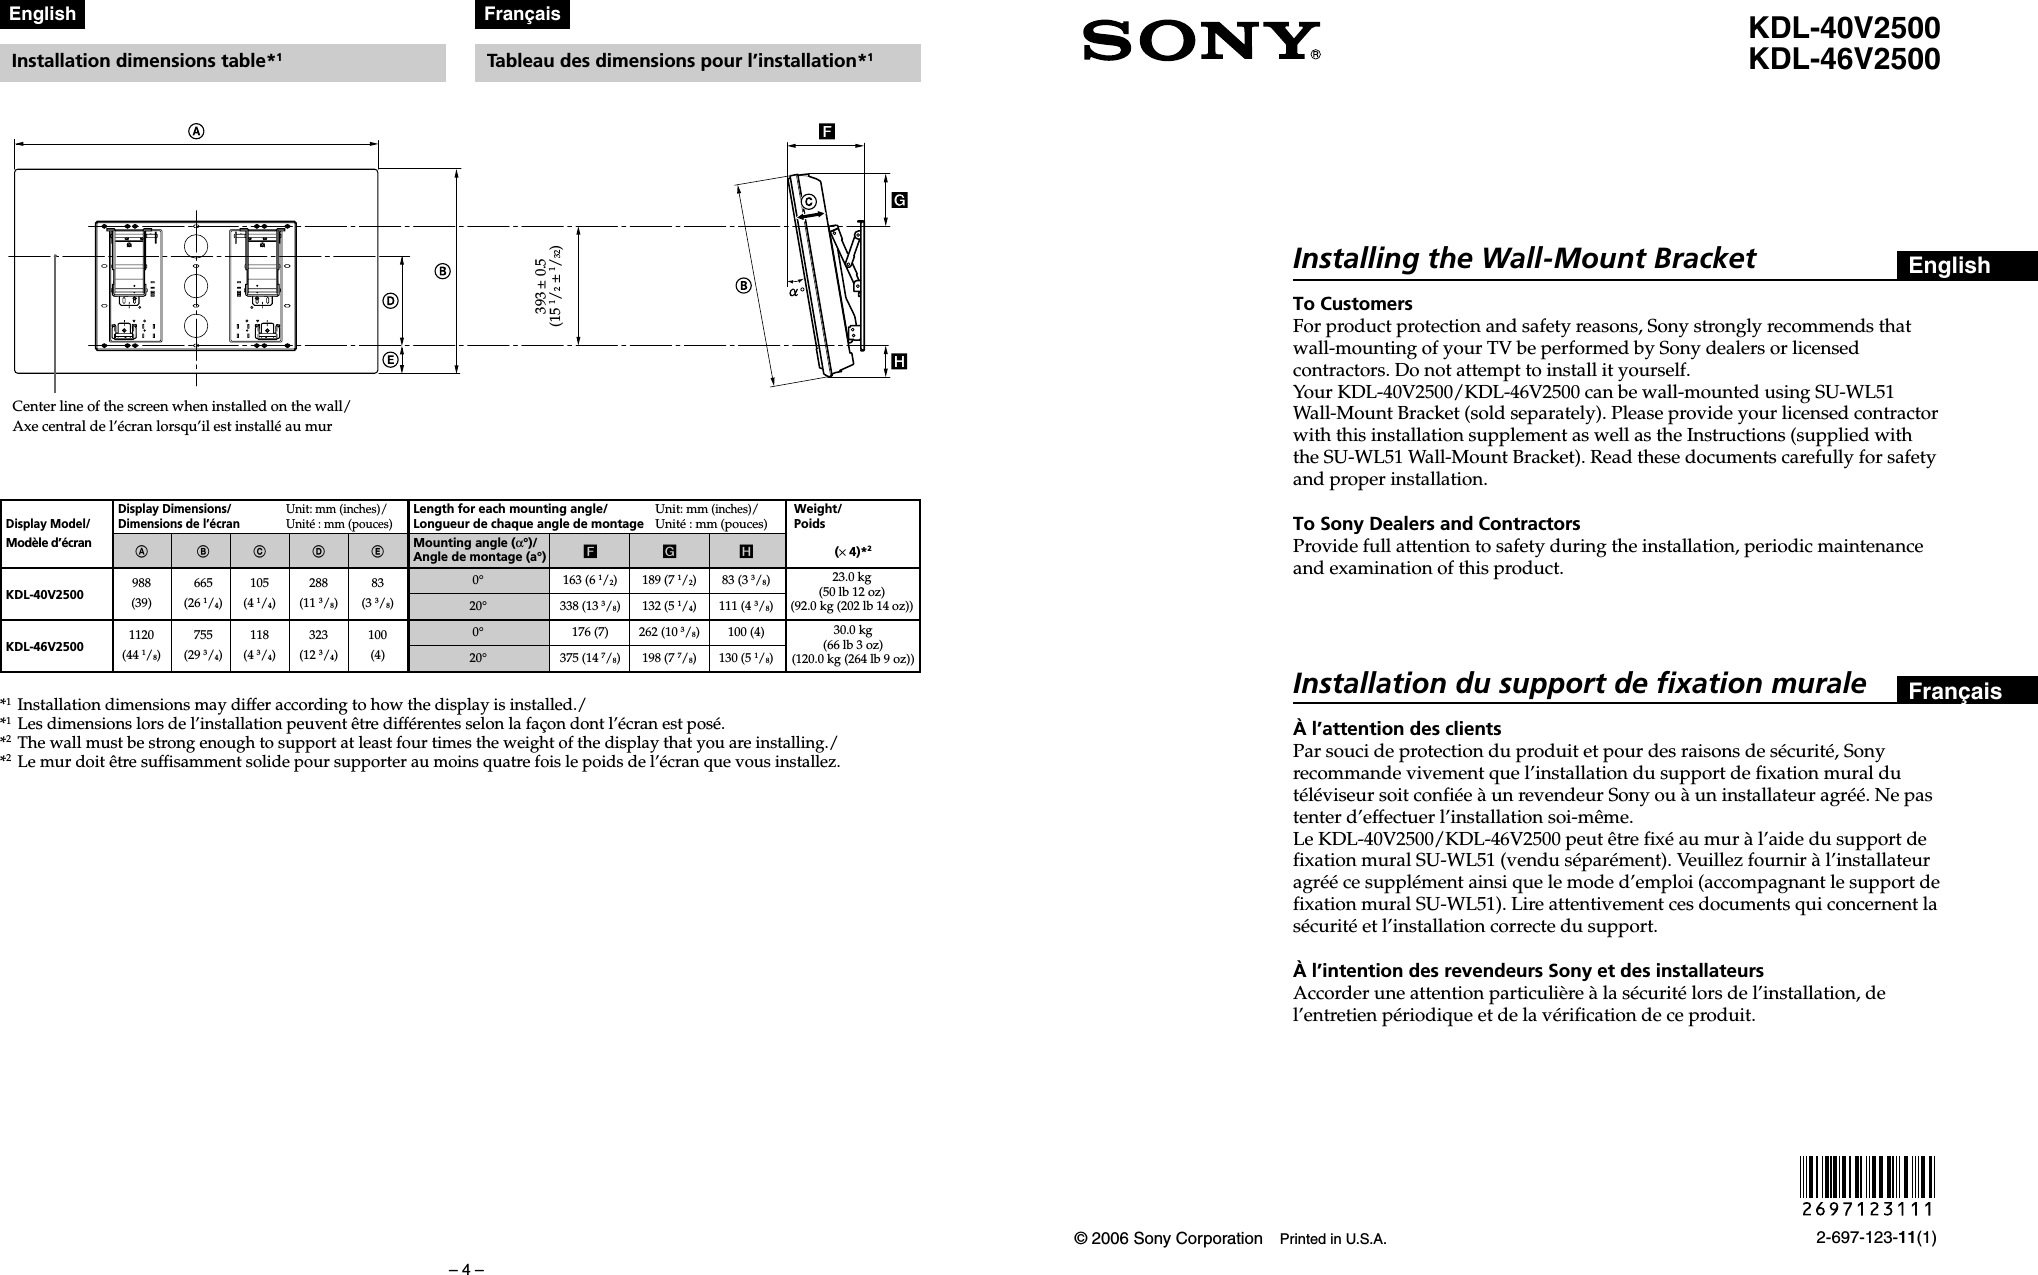 sony kdl-46v2500 wall mount instructions